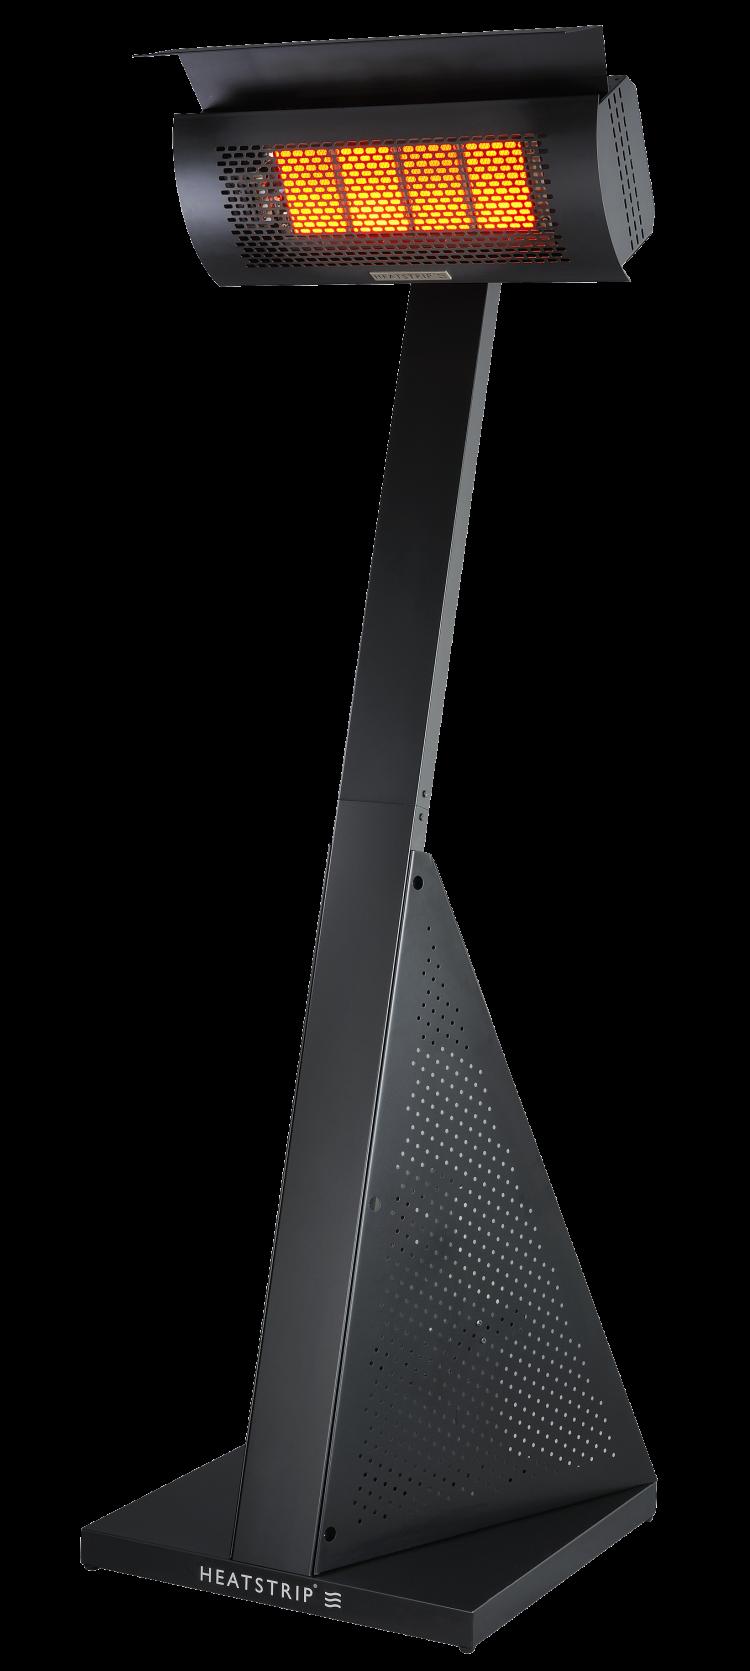 Heatstrip Portable Heater 50 MB